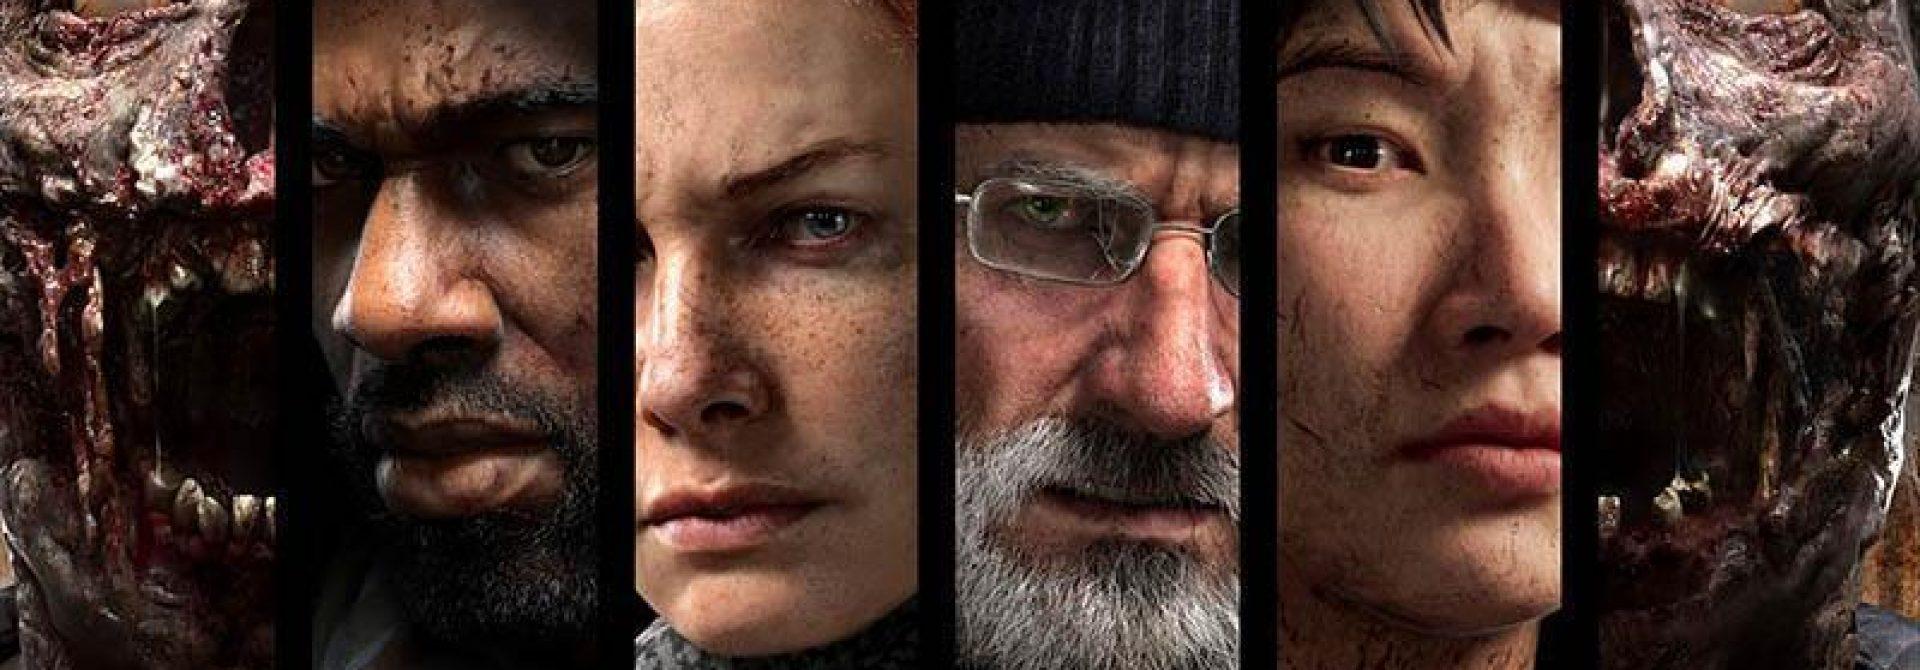 OVERKILL'S The Walking Dead PC Closed Beta Begins Oct. 9